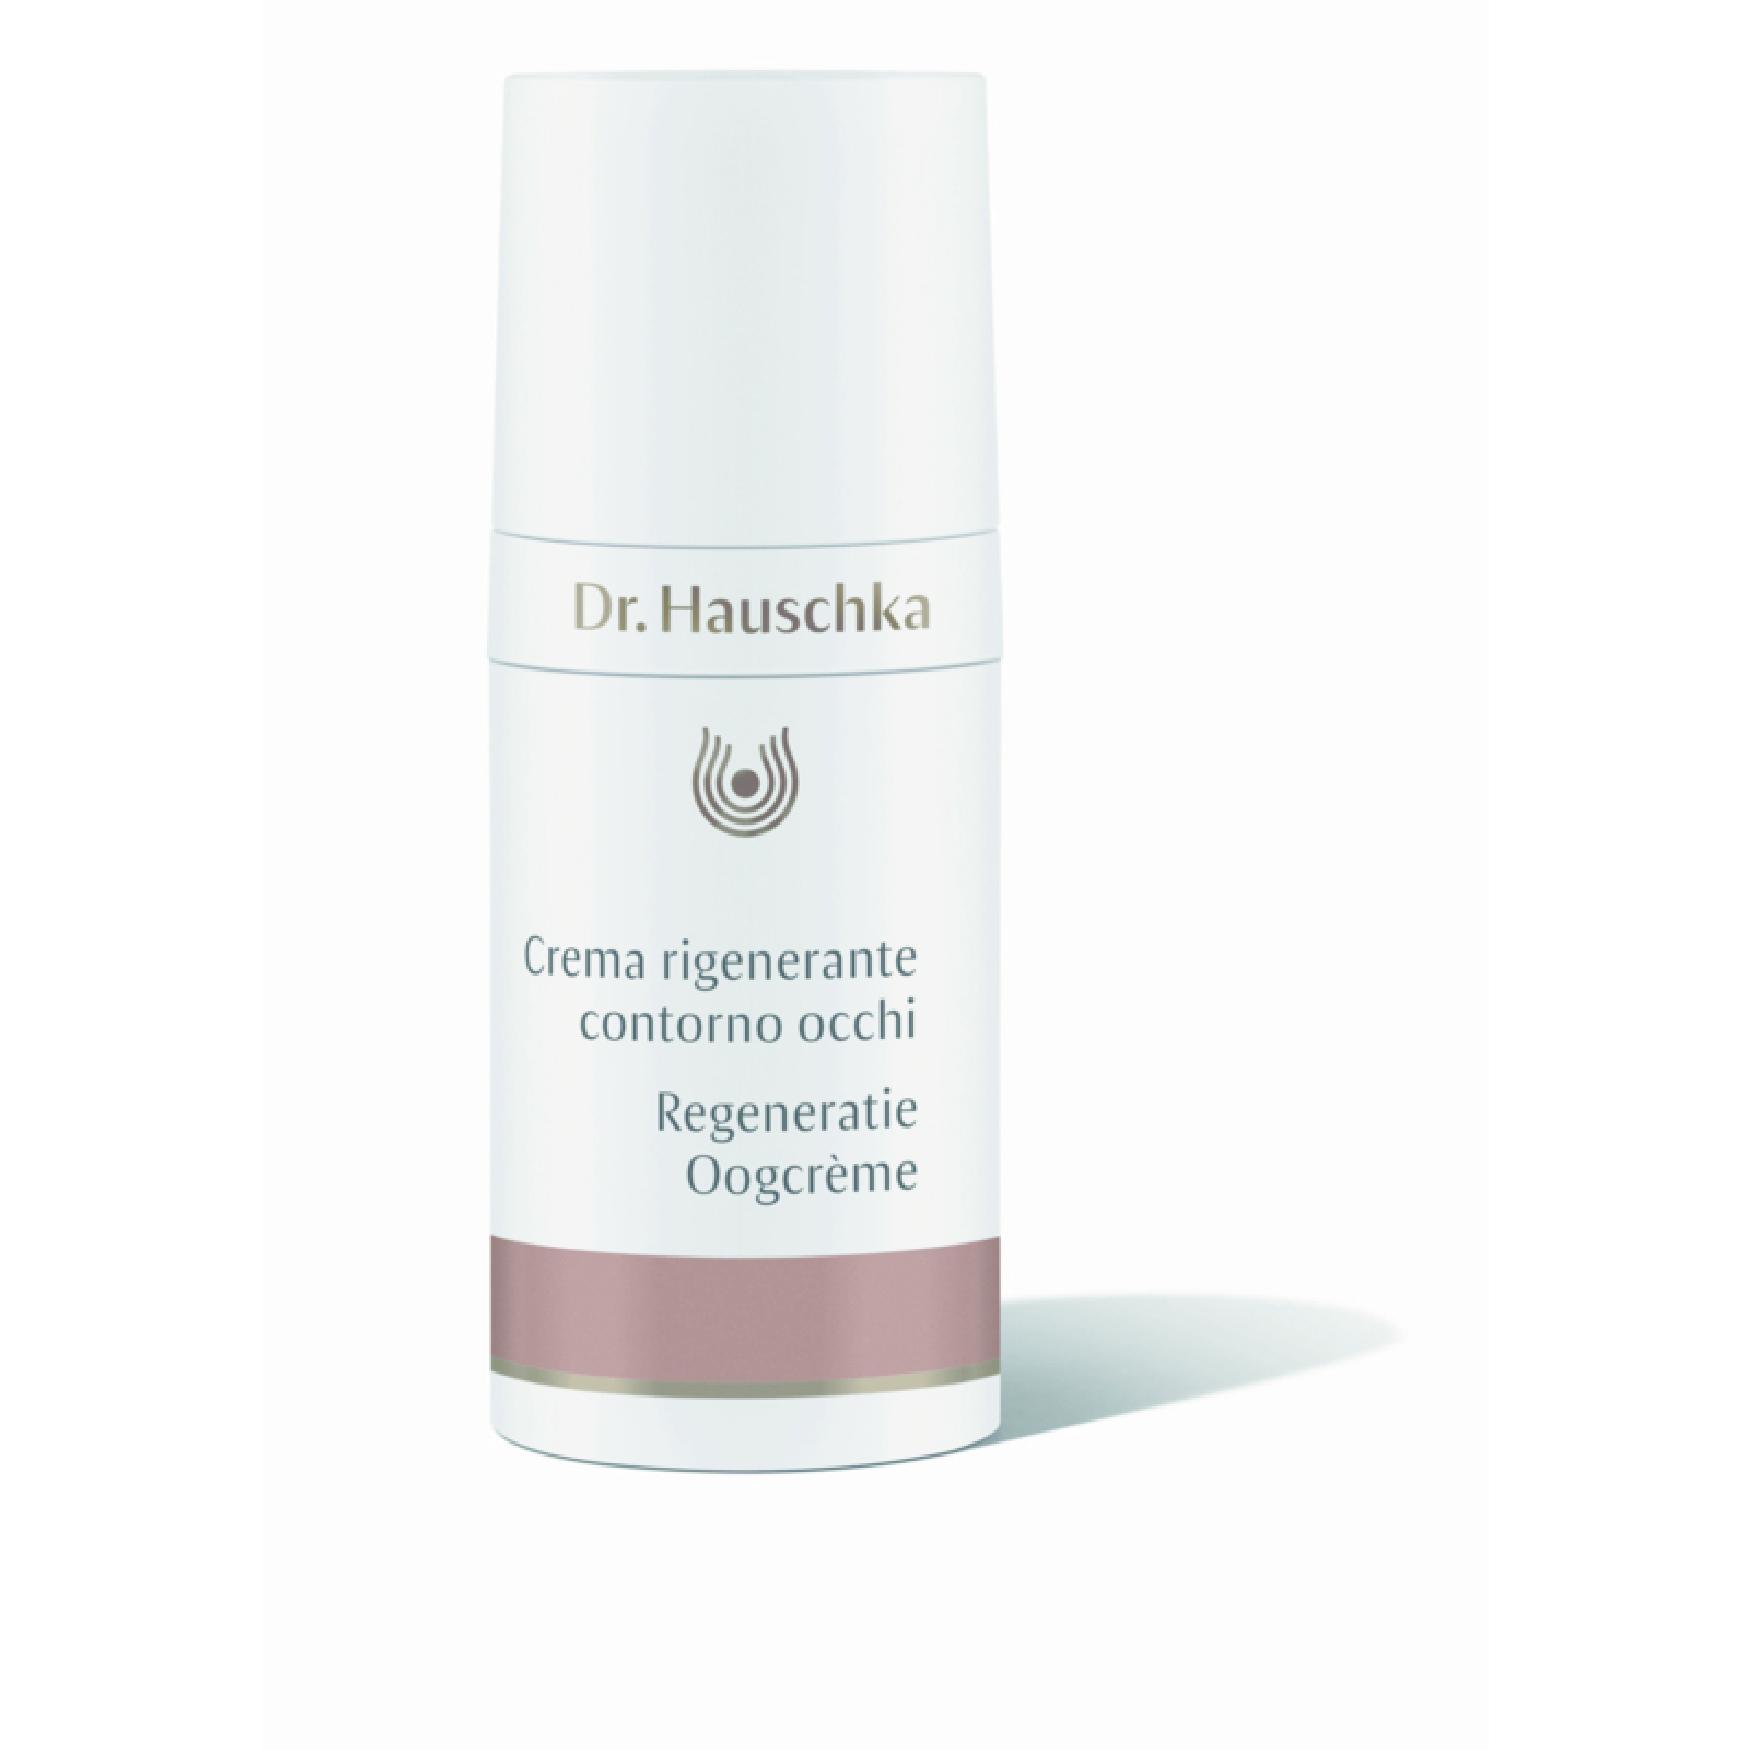 Regeneratie Oogcrème 15ml – DR. HAUSCHKA